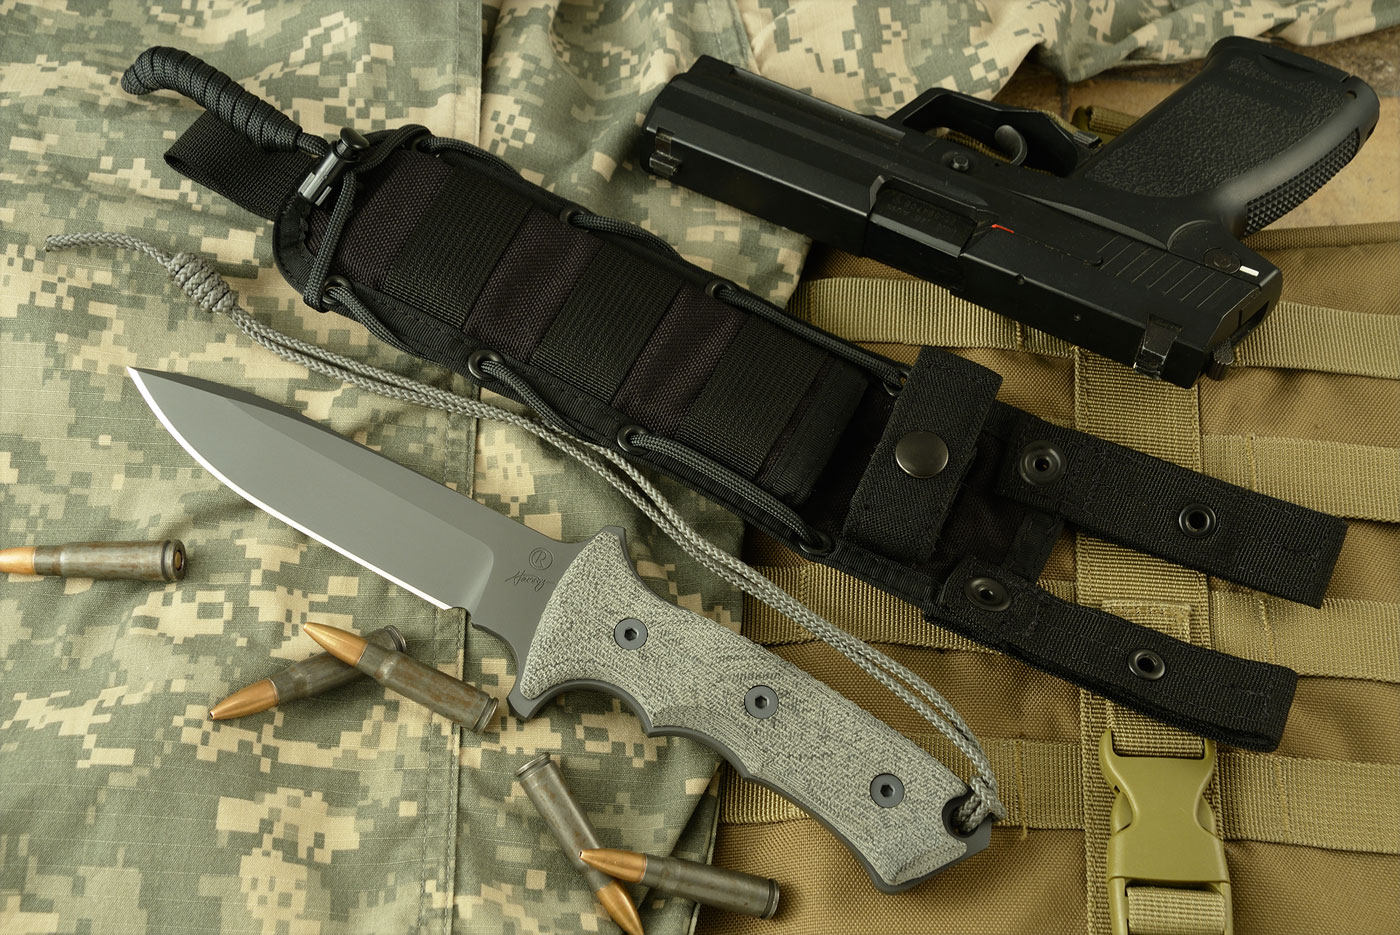 Green Beret (5-1/2 inch)